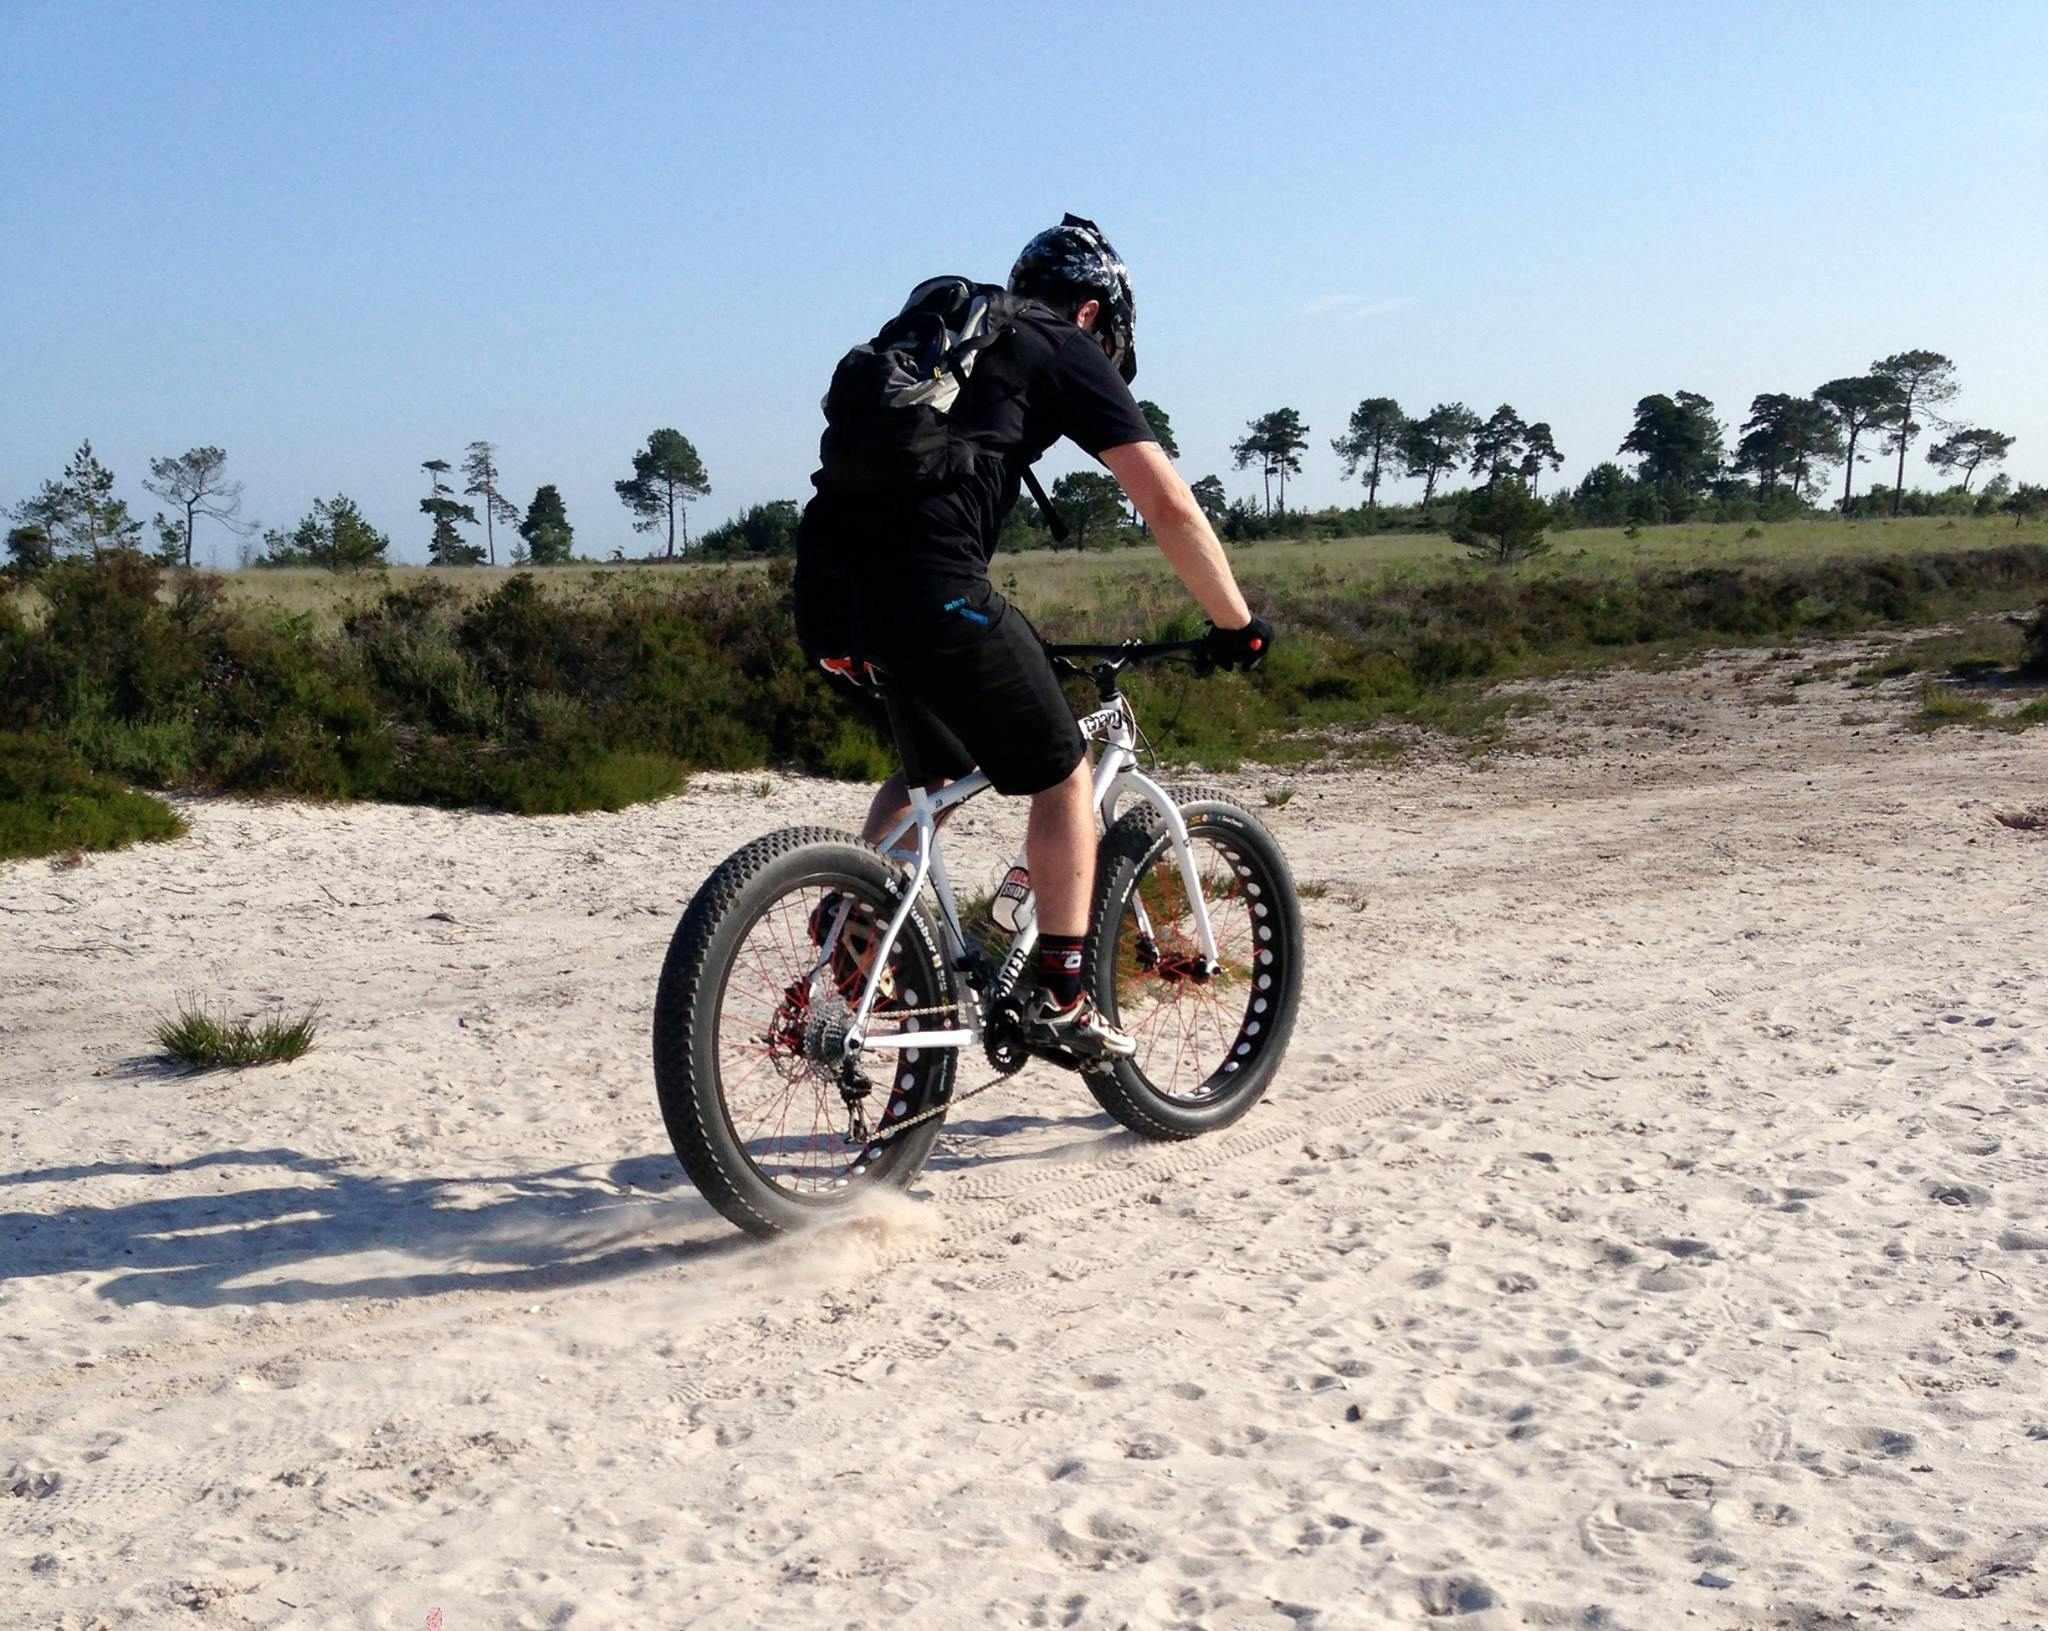 The Charge Bikes Cooker Maxi prototype fat bike